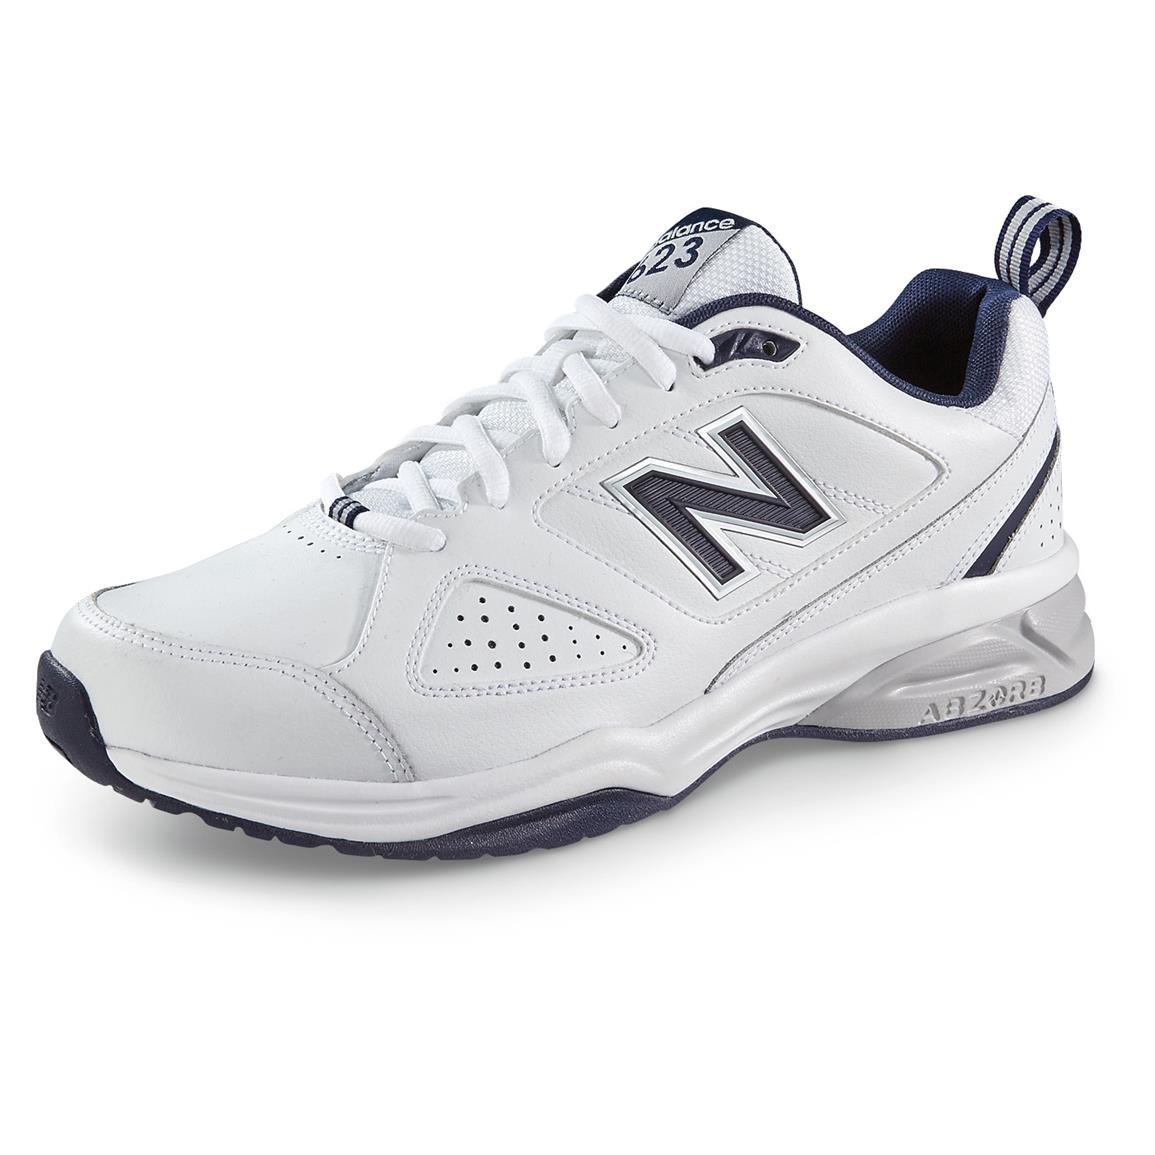 new balance 623 new balance men¿s 623 v3 cross trainers, white / navy KUTSURP